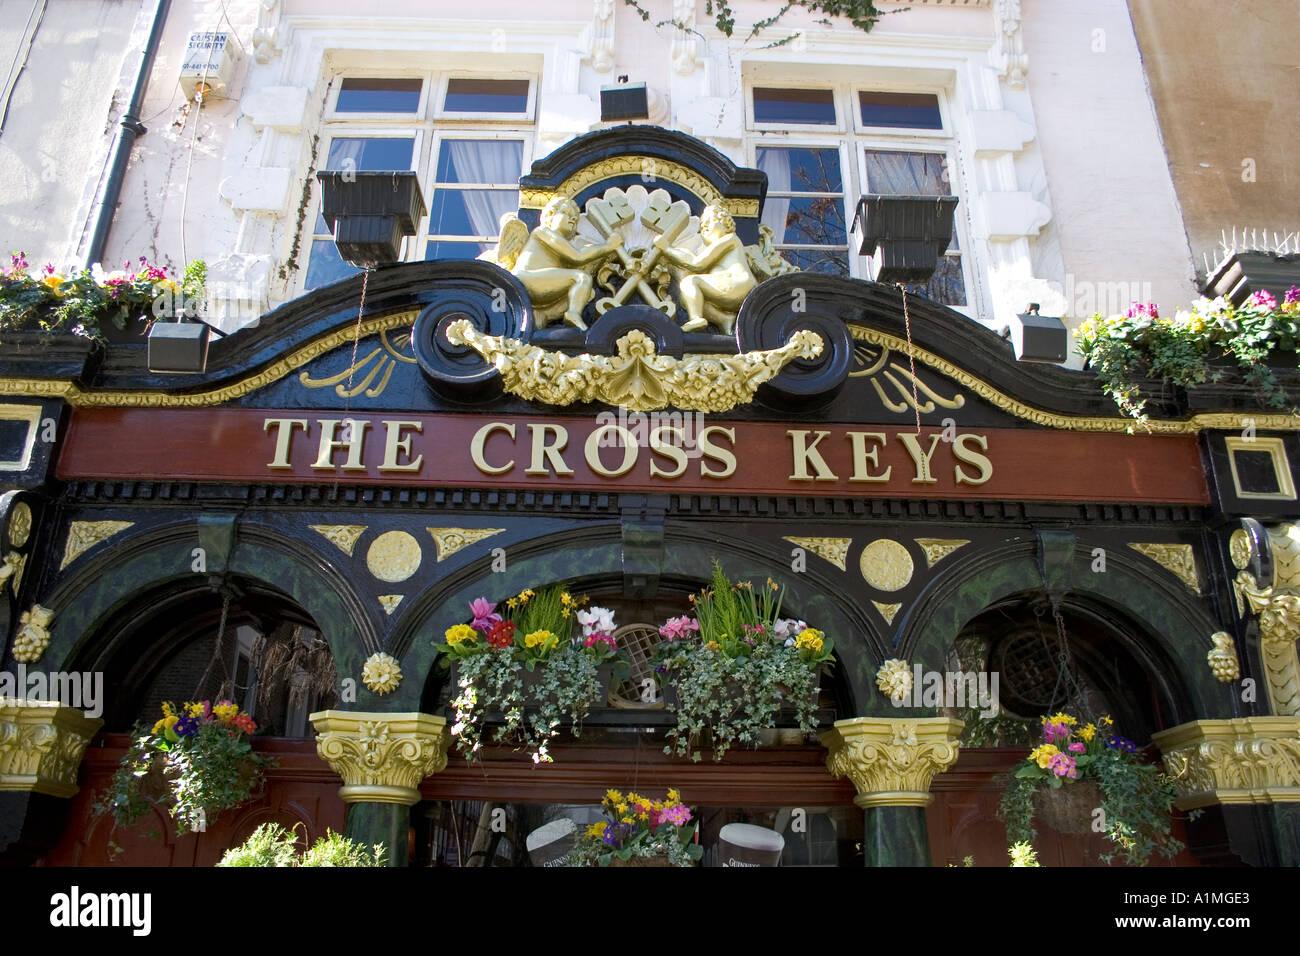 The Cross Keys public house Covent Garden London England UK Europe - Stock Image